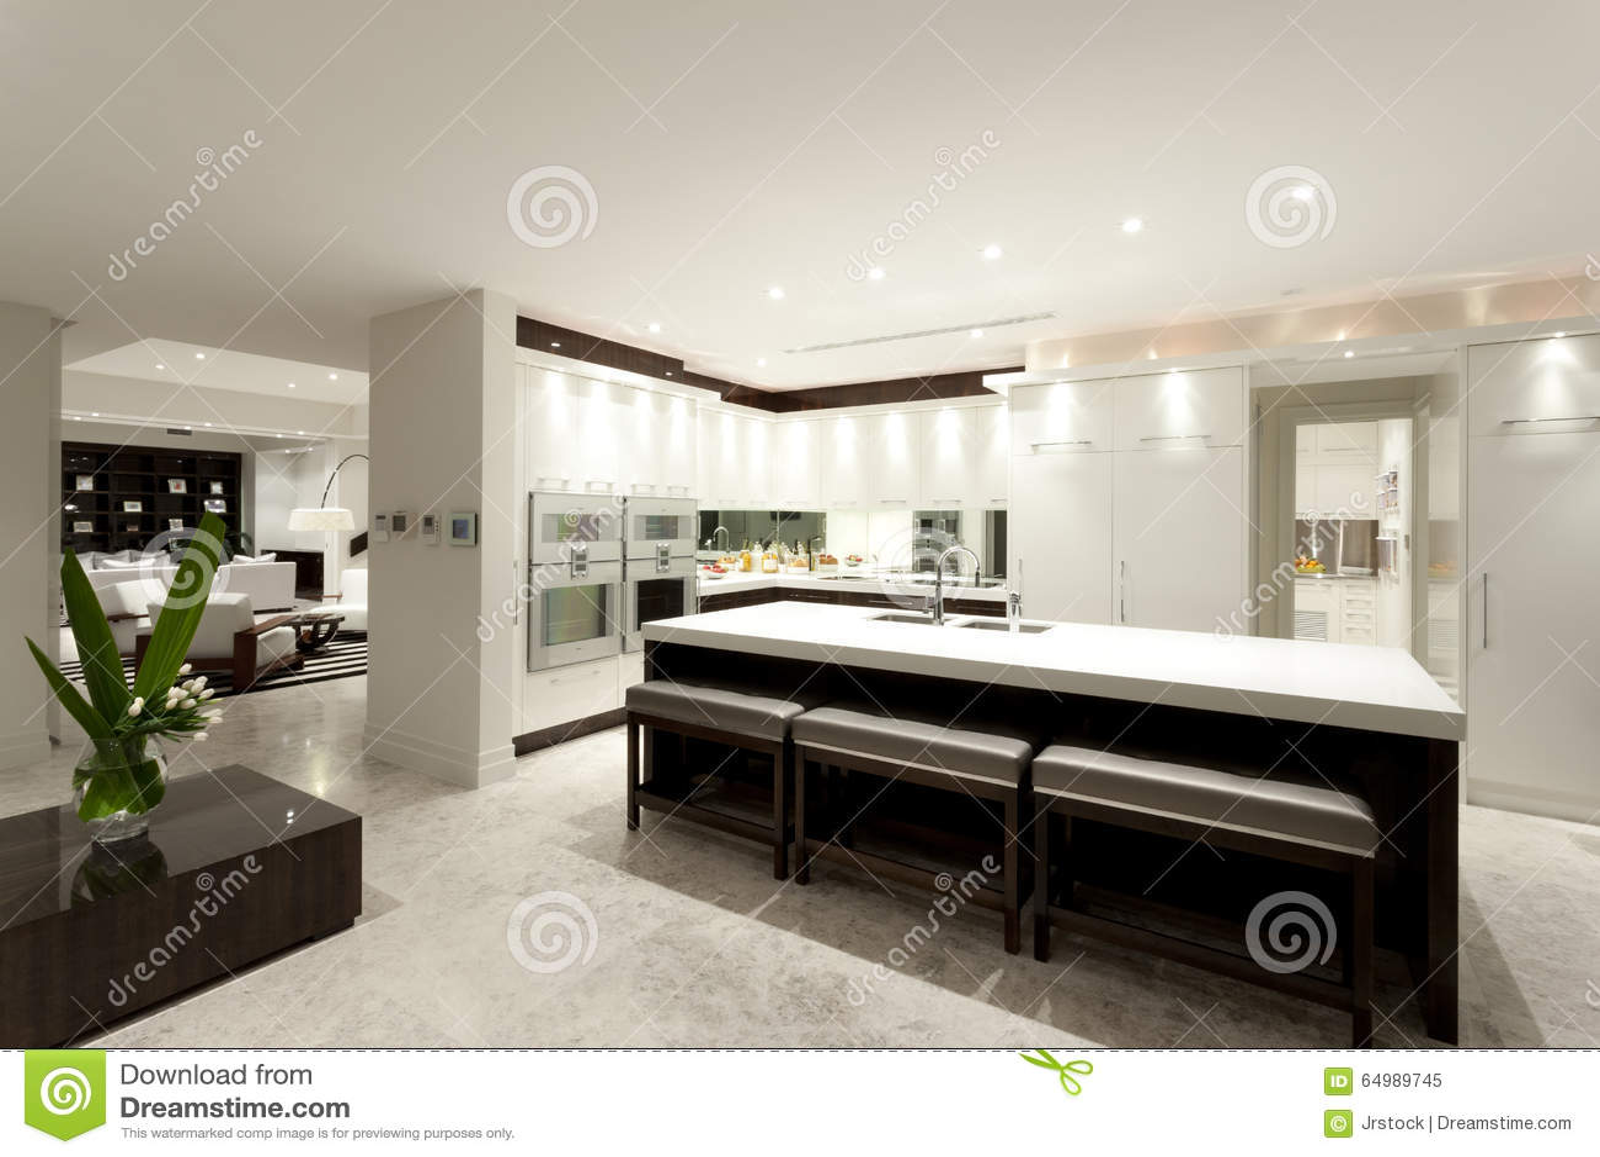 Modern kitchen with a big island